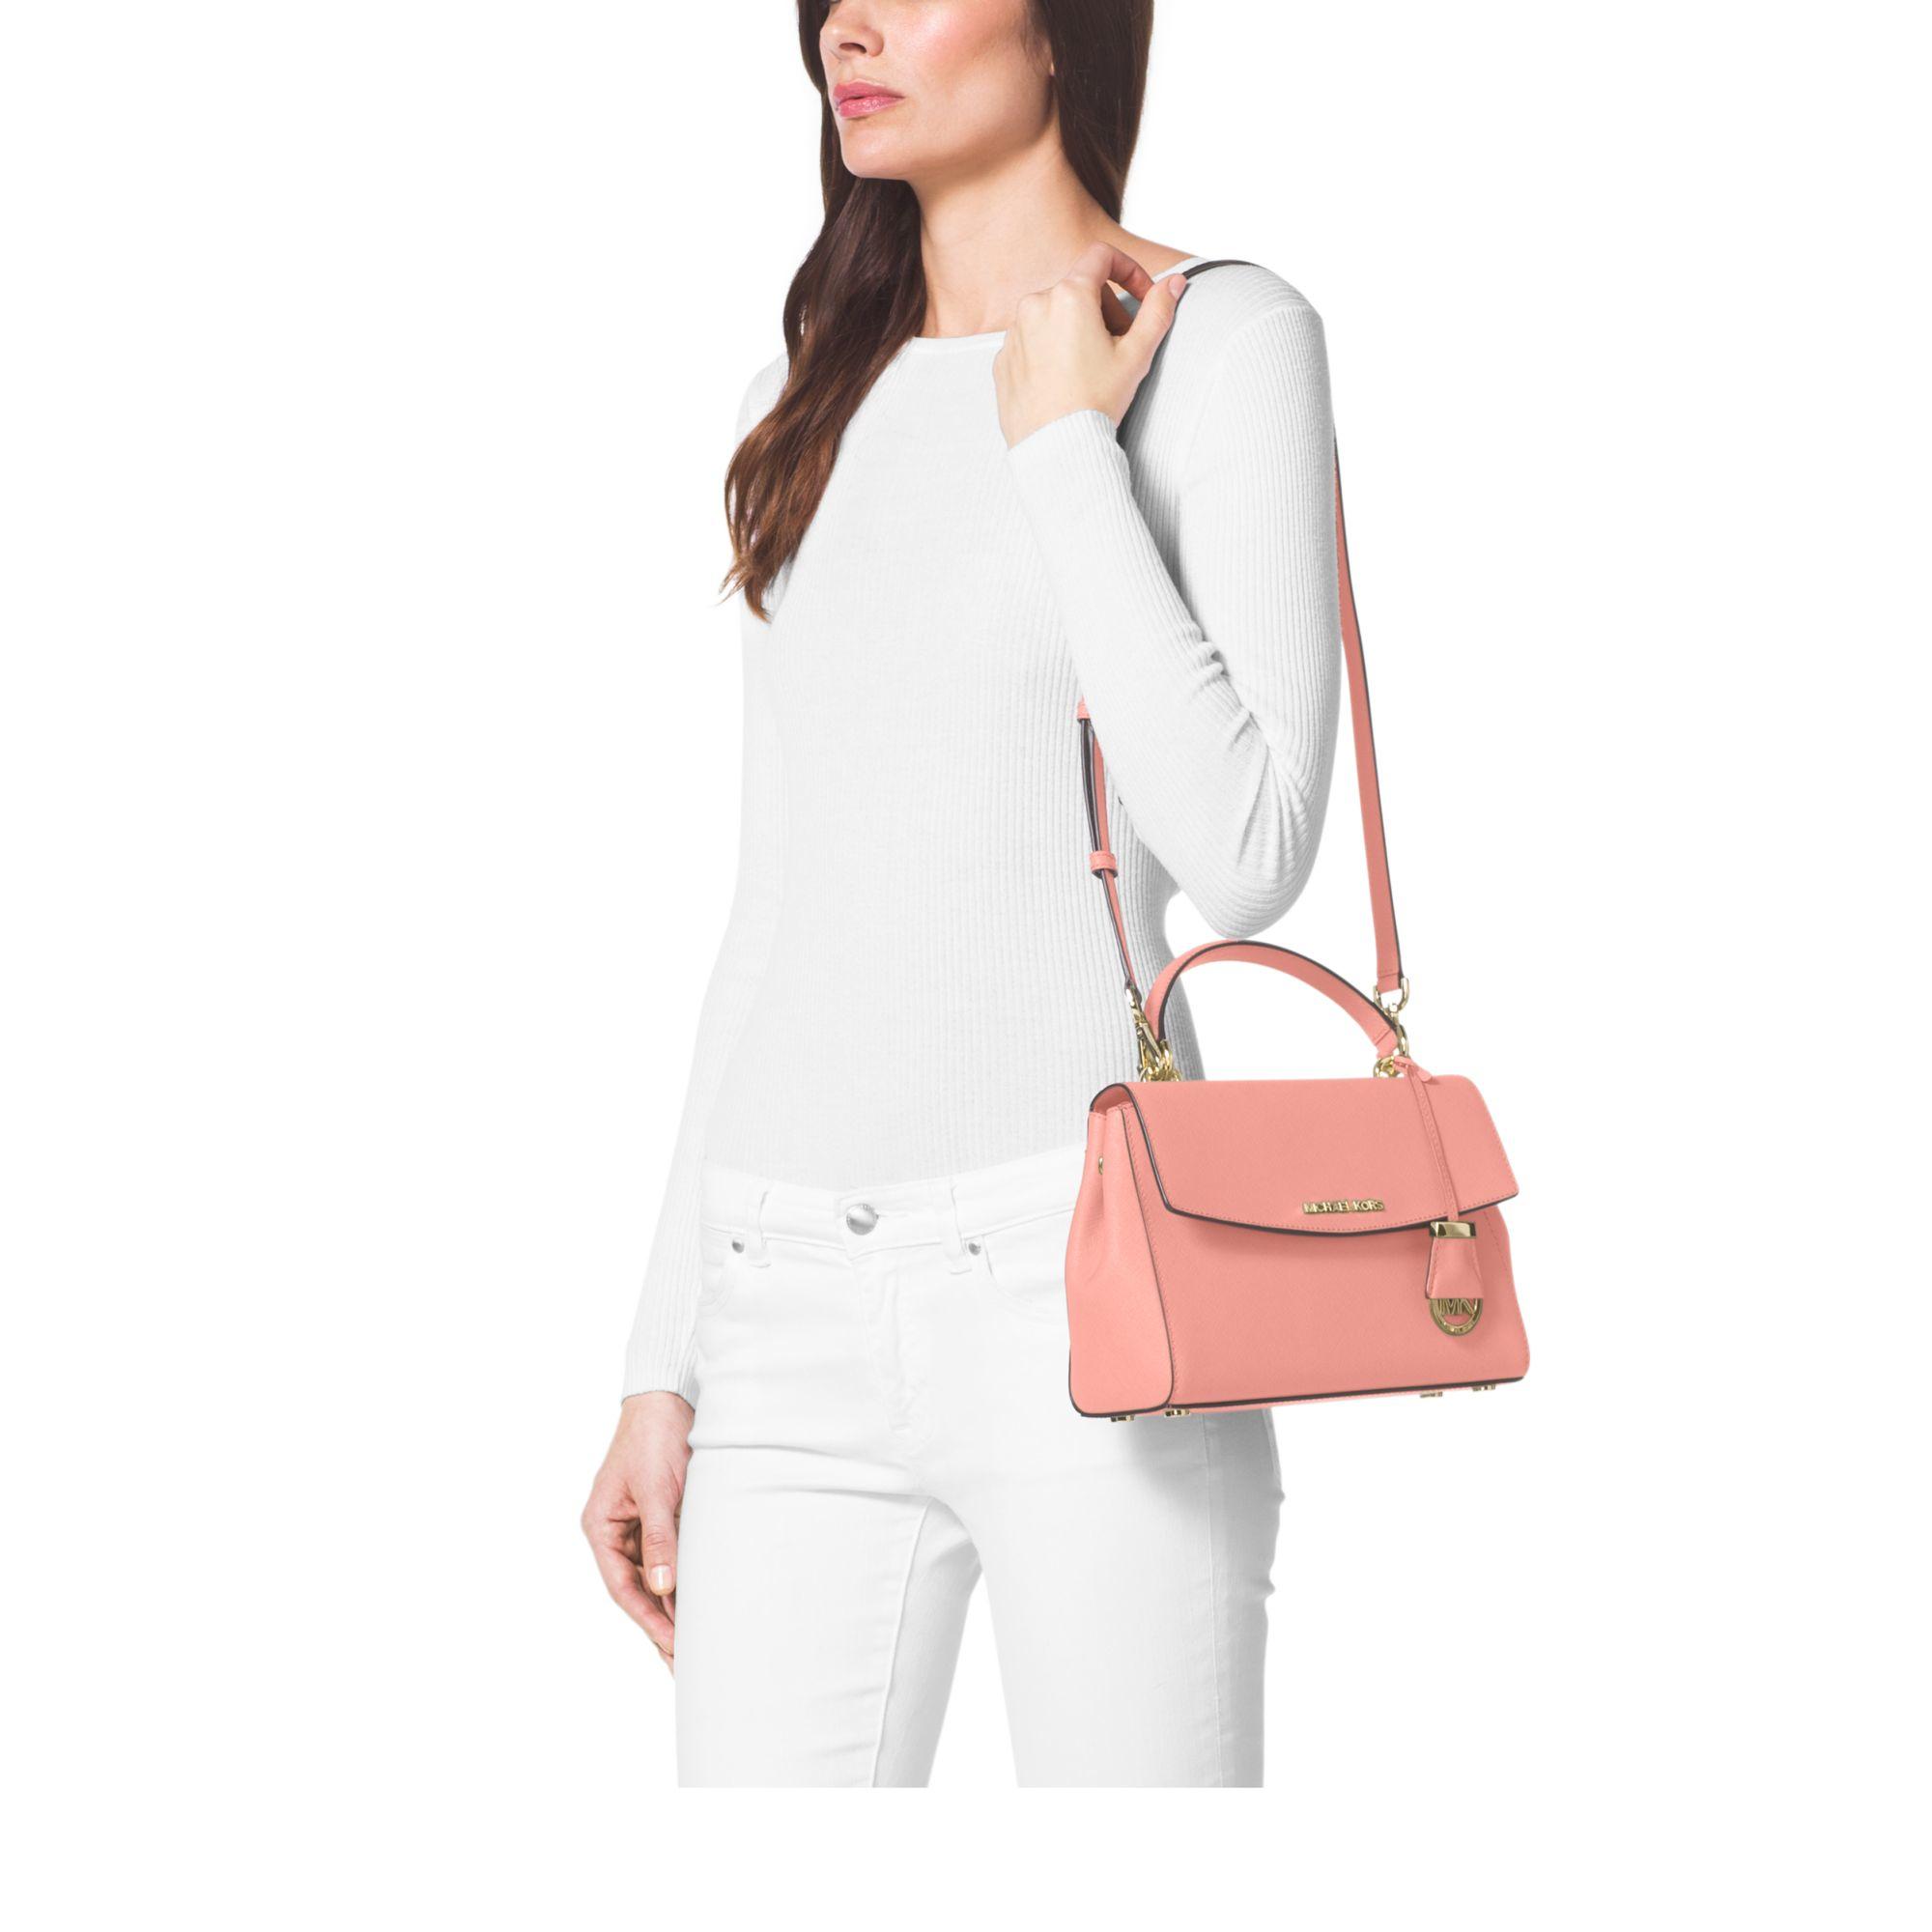 d5faef529b28 michael kors ava mini pale pink repair handbag spine